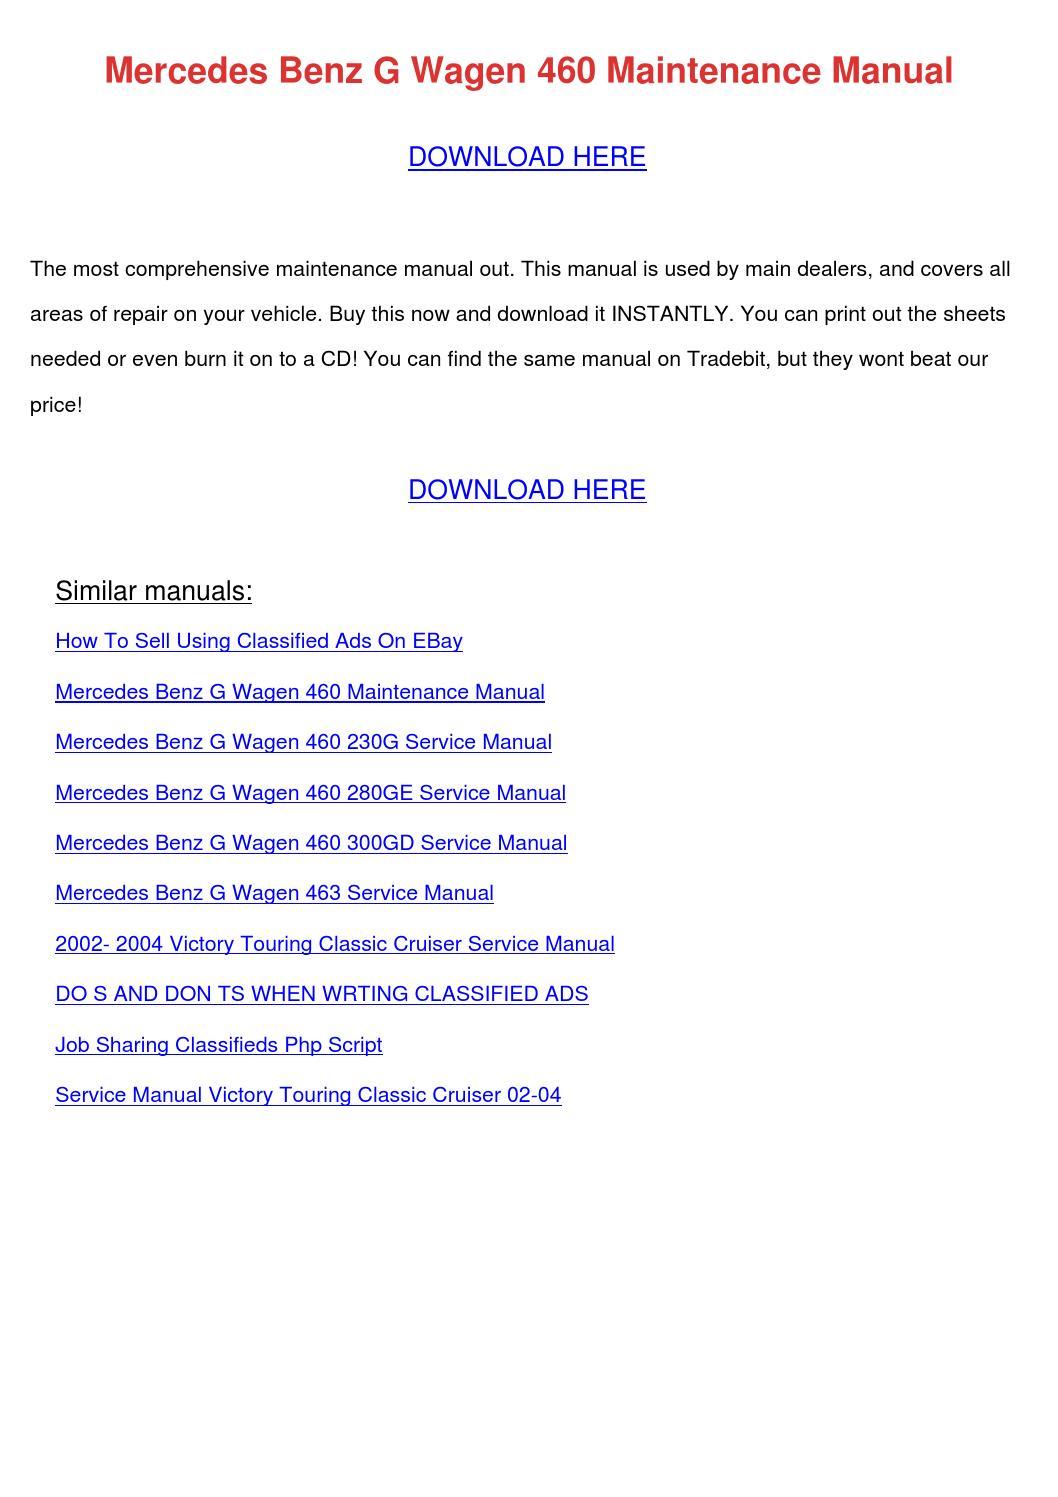 Mercedes Benz G Wagen 460 Maintenance Manual By Rositariddle